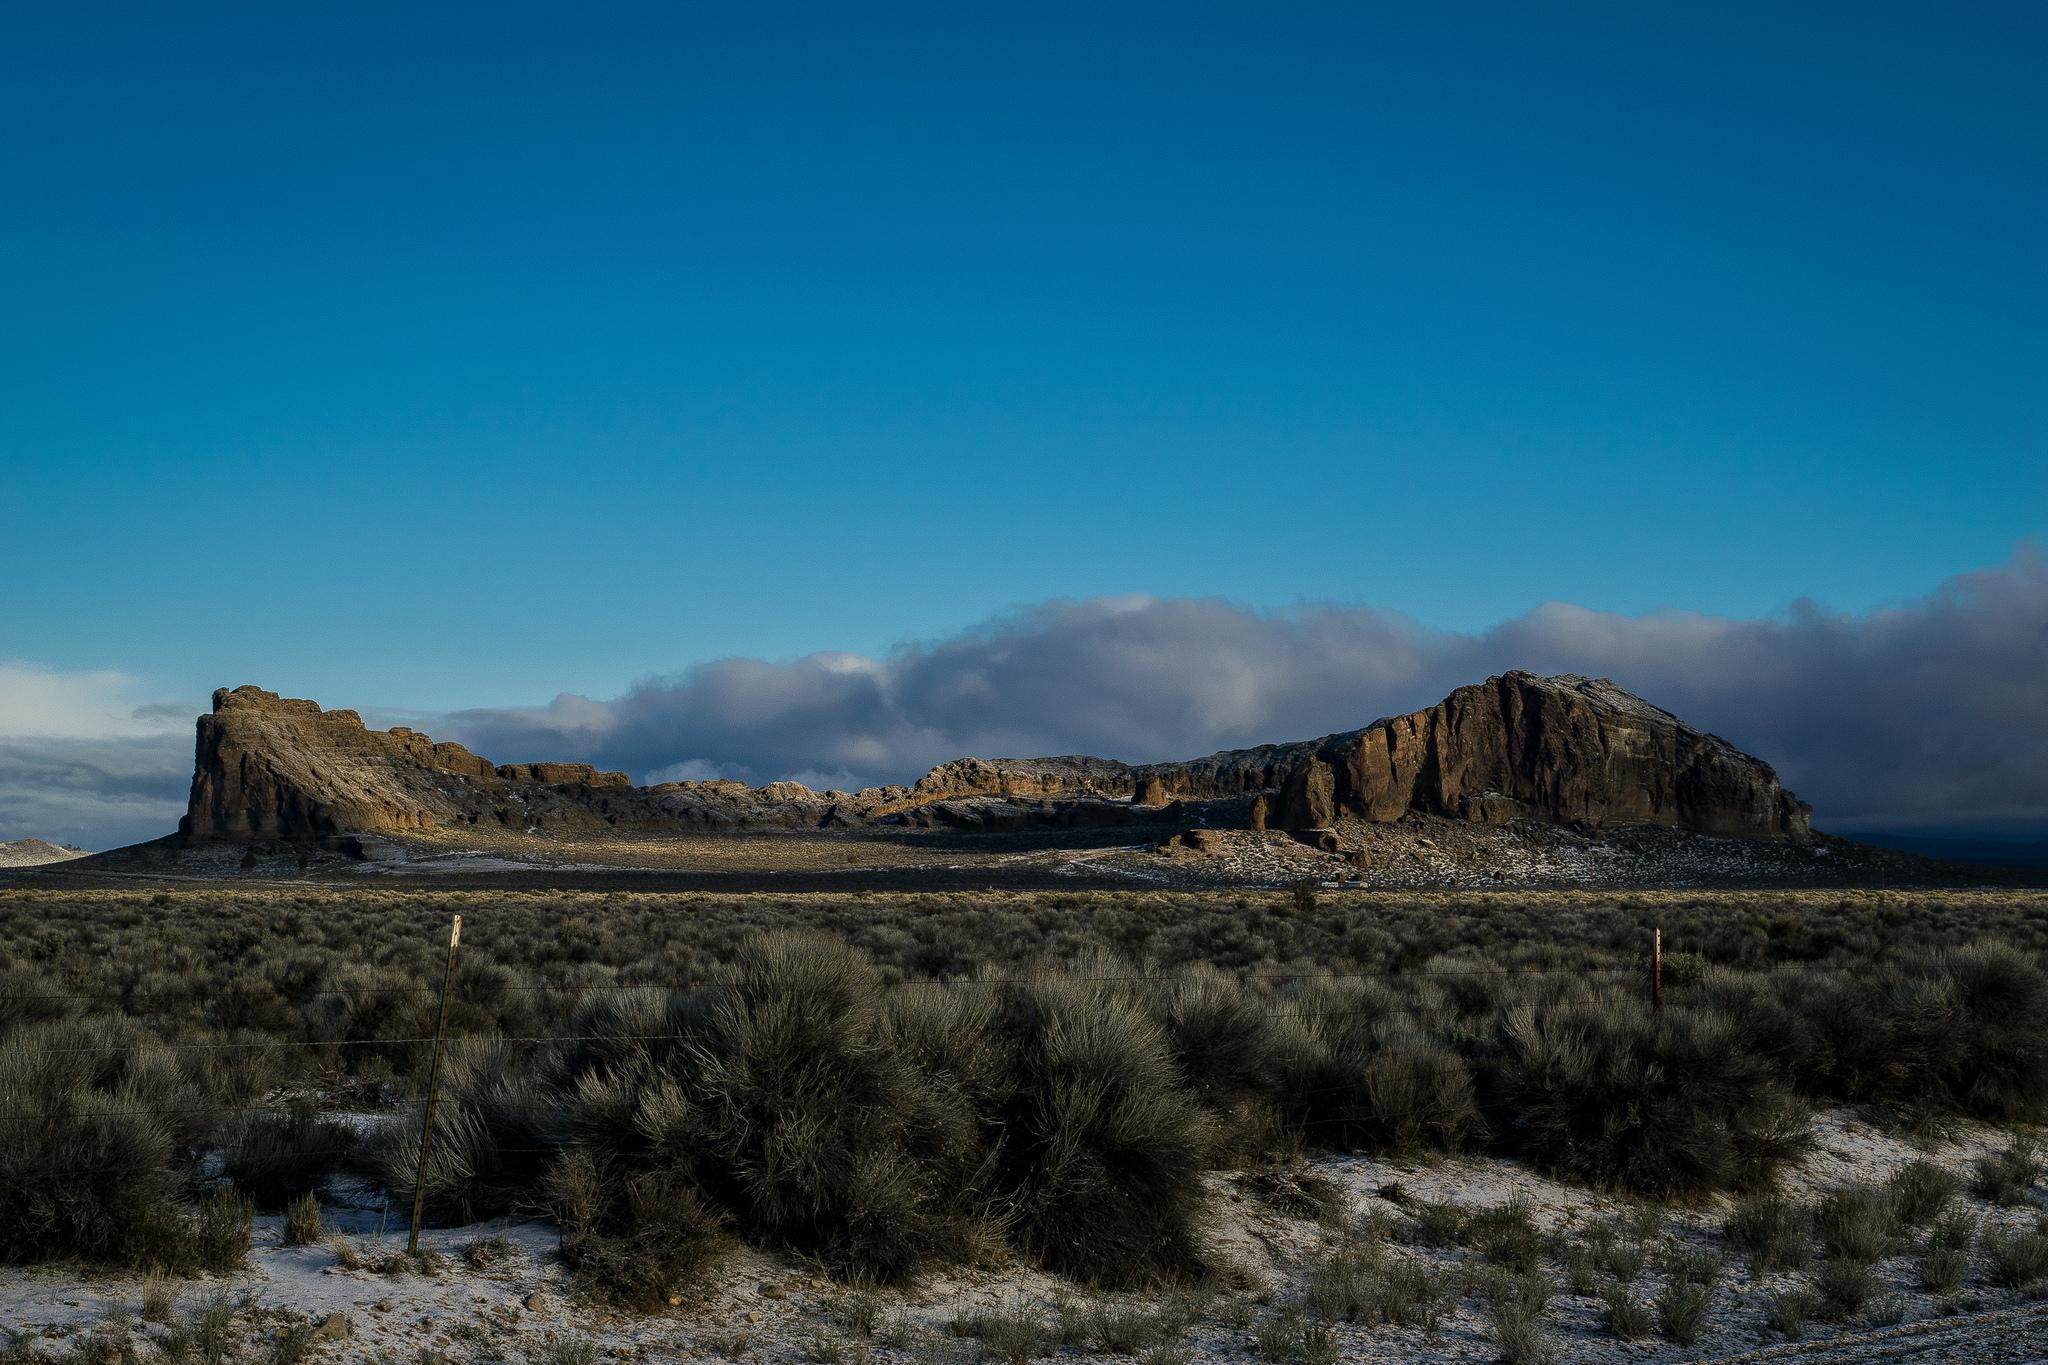 Fort Rock Is A Unique Hidden Gem In The Oregon Desert